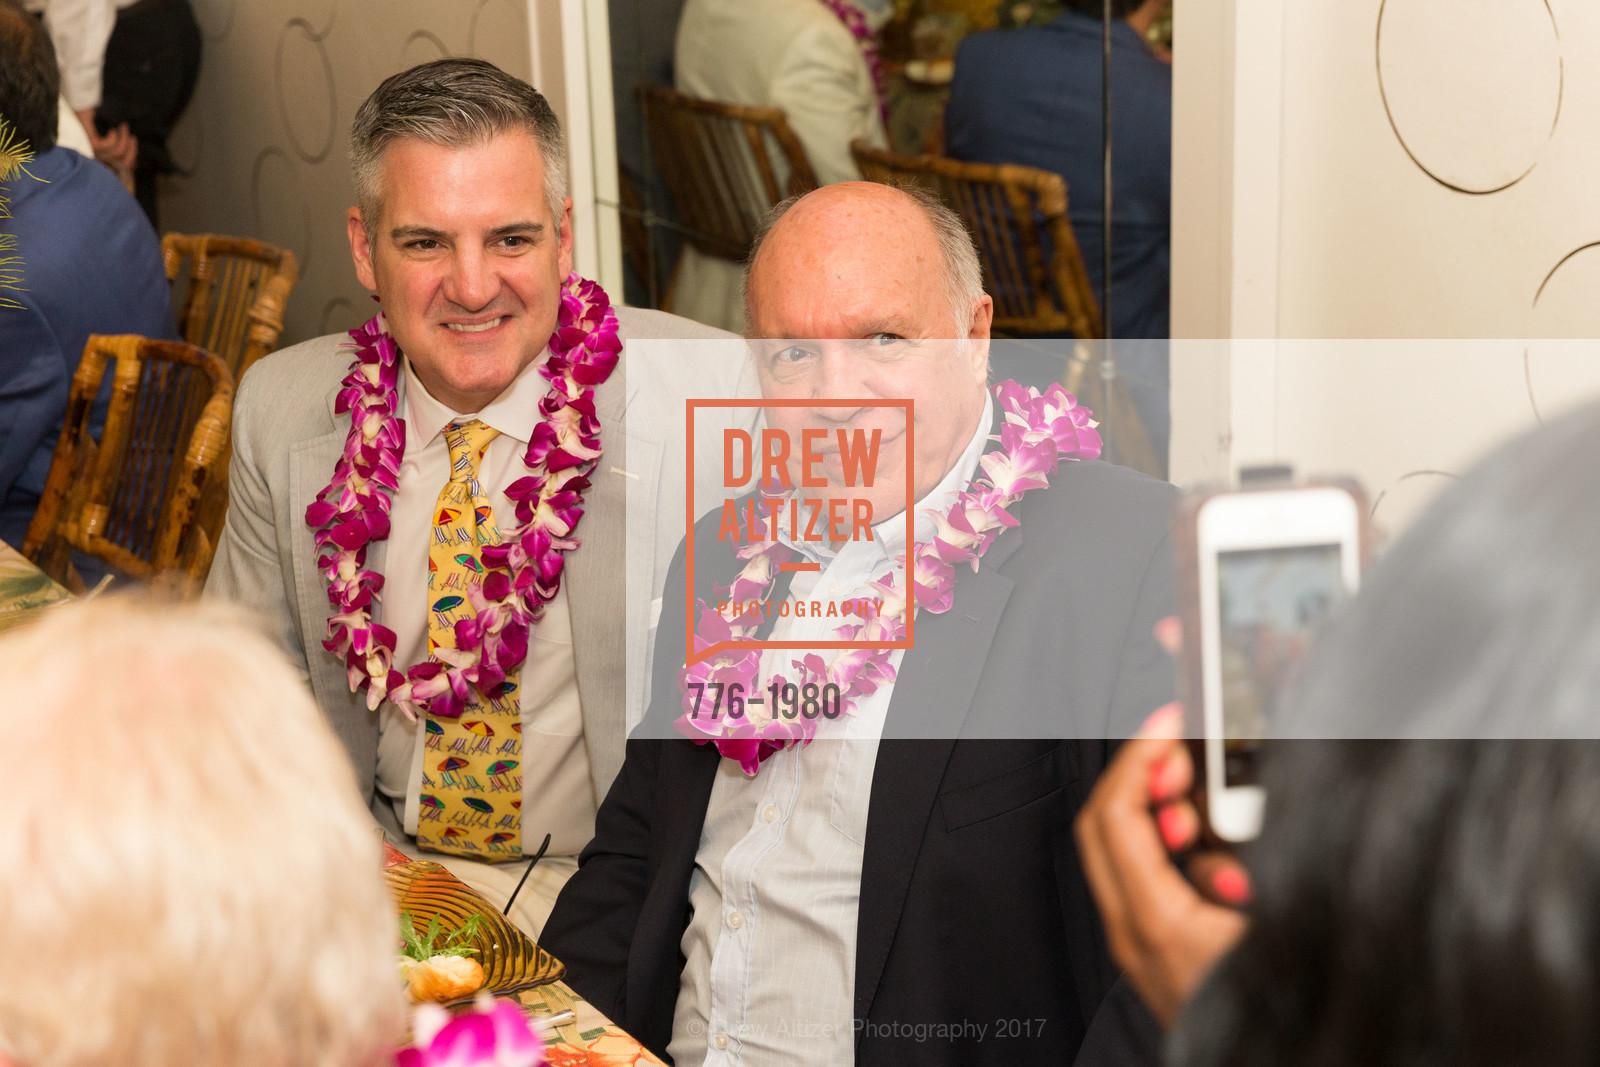 Tim Graffigna, Bill Hales, Aubrey Brewster's Purely Paradise Birthday Luncheon 2017, Neiman Marcus. 150 Stockton St  SF, California 94108, March 24th, 2017